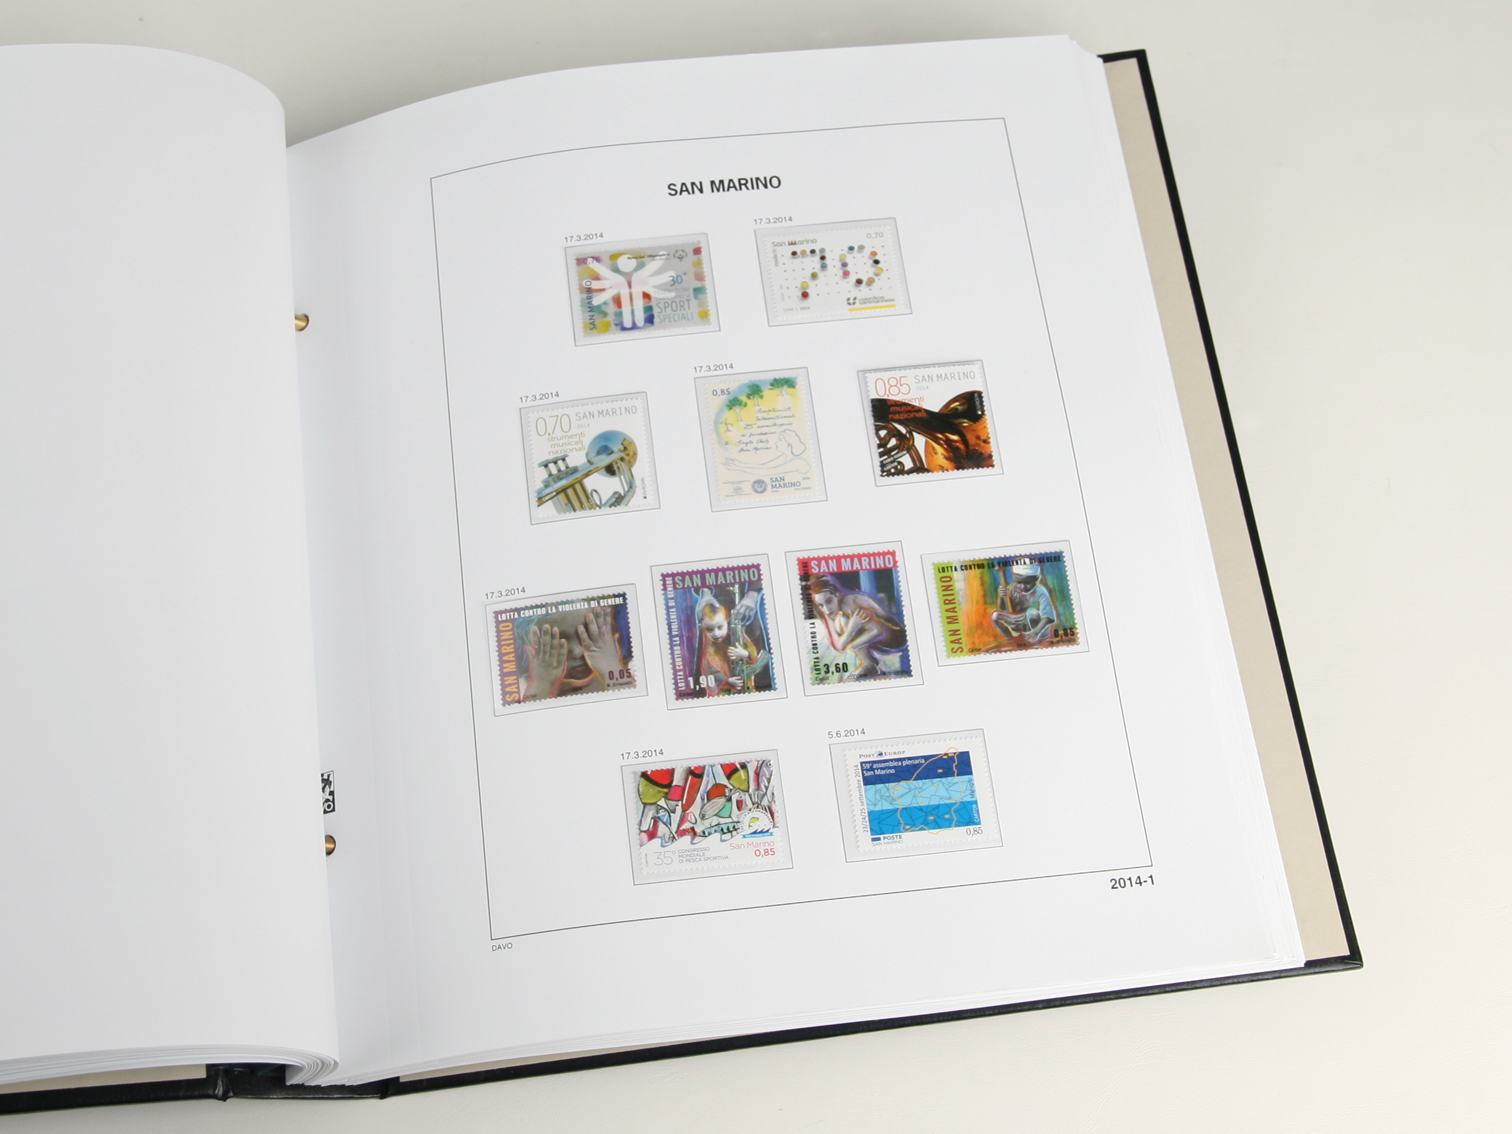 San Marino Luxe Album Volume 4 2012-2019